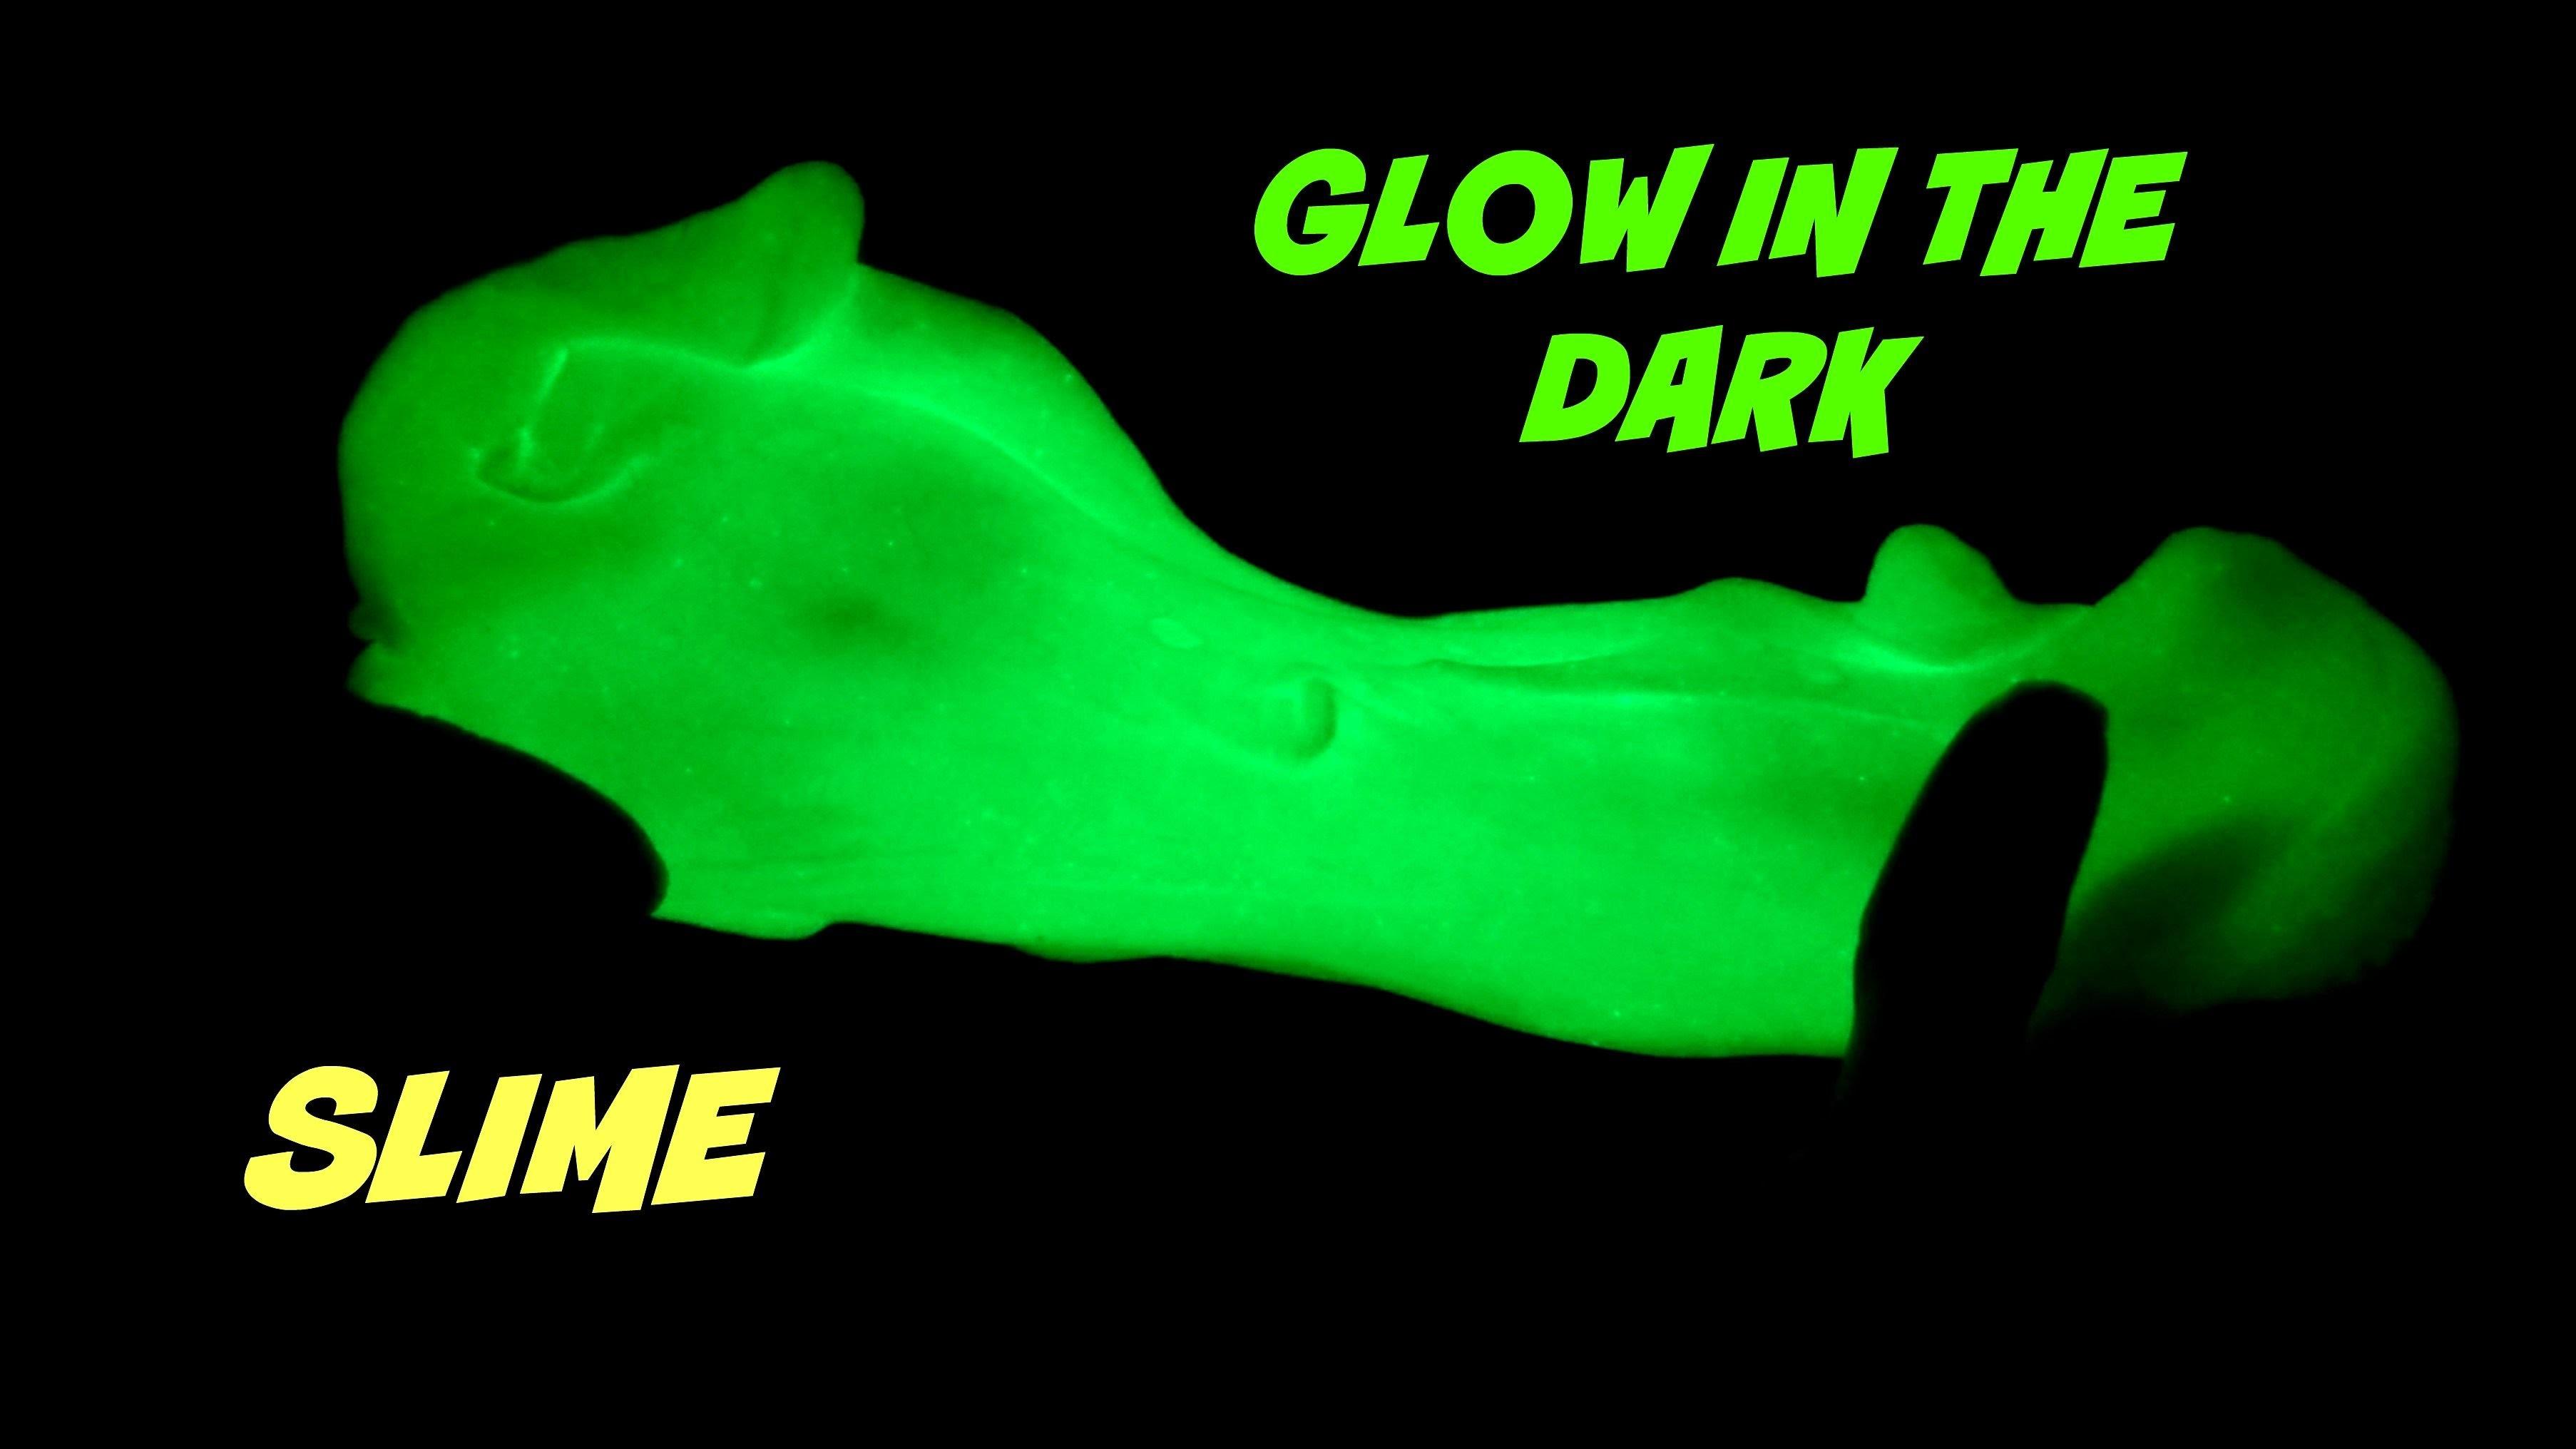 glow in the dark slime - HD3612×2032